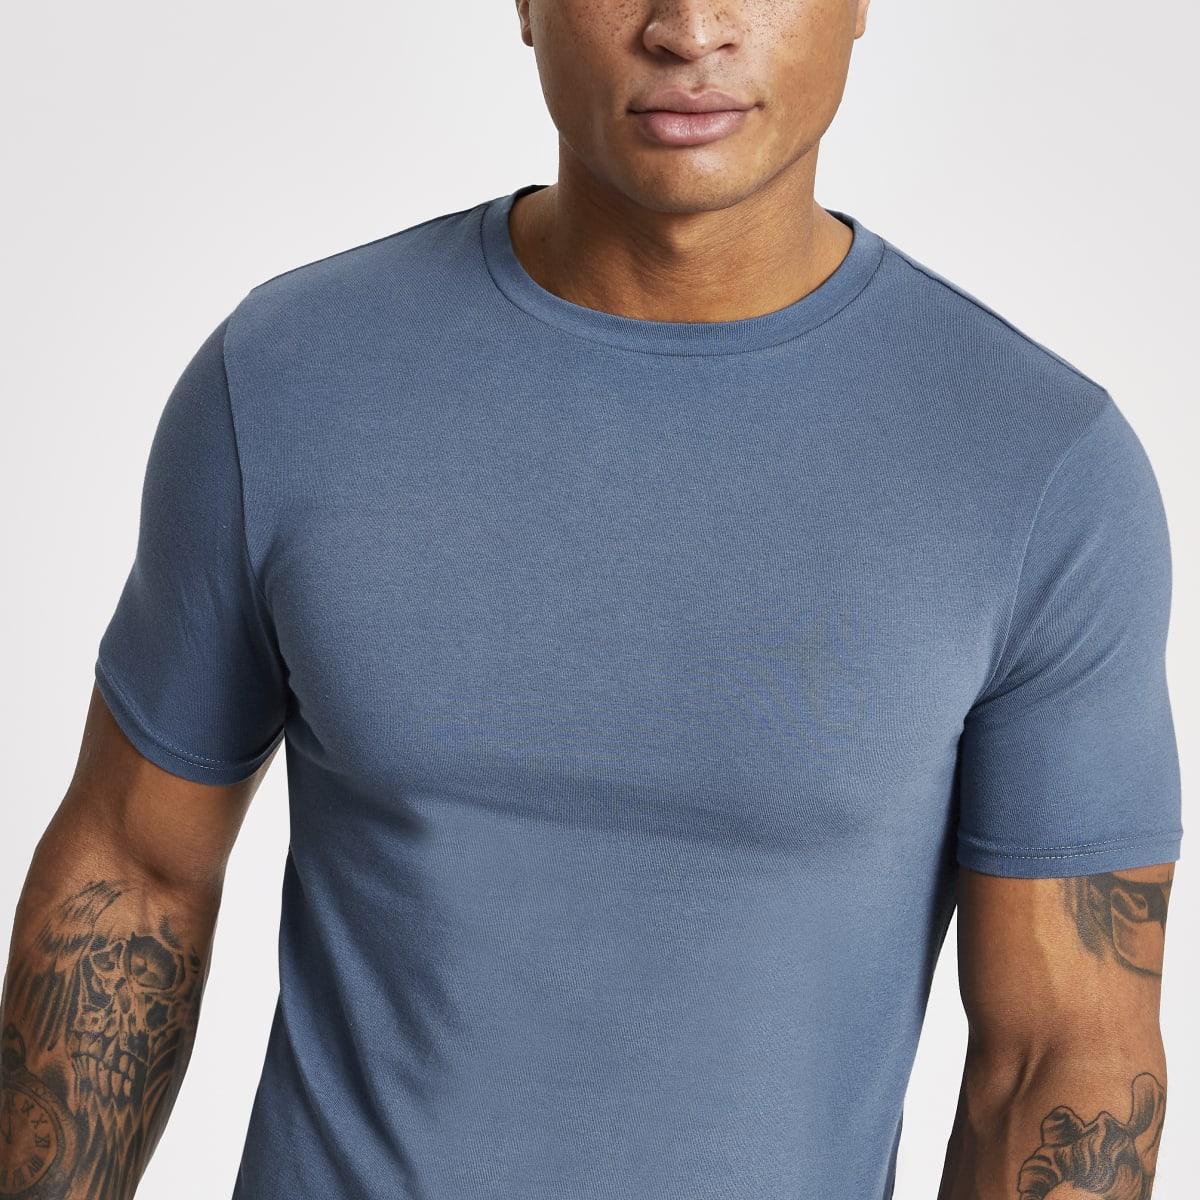 Blue muscle fit T-shirt